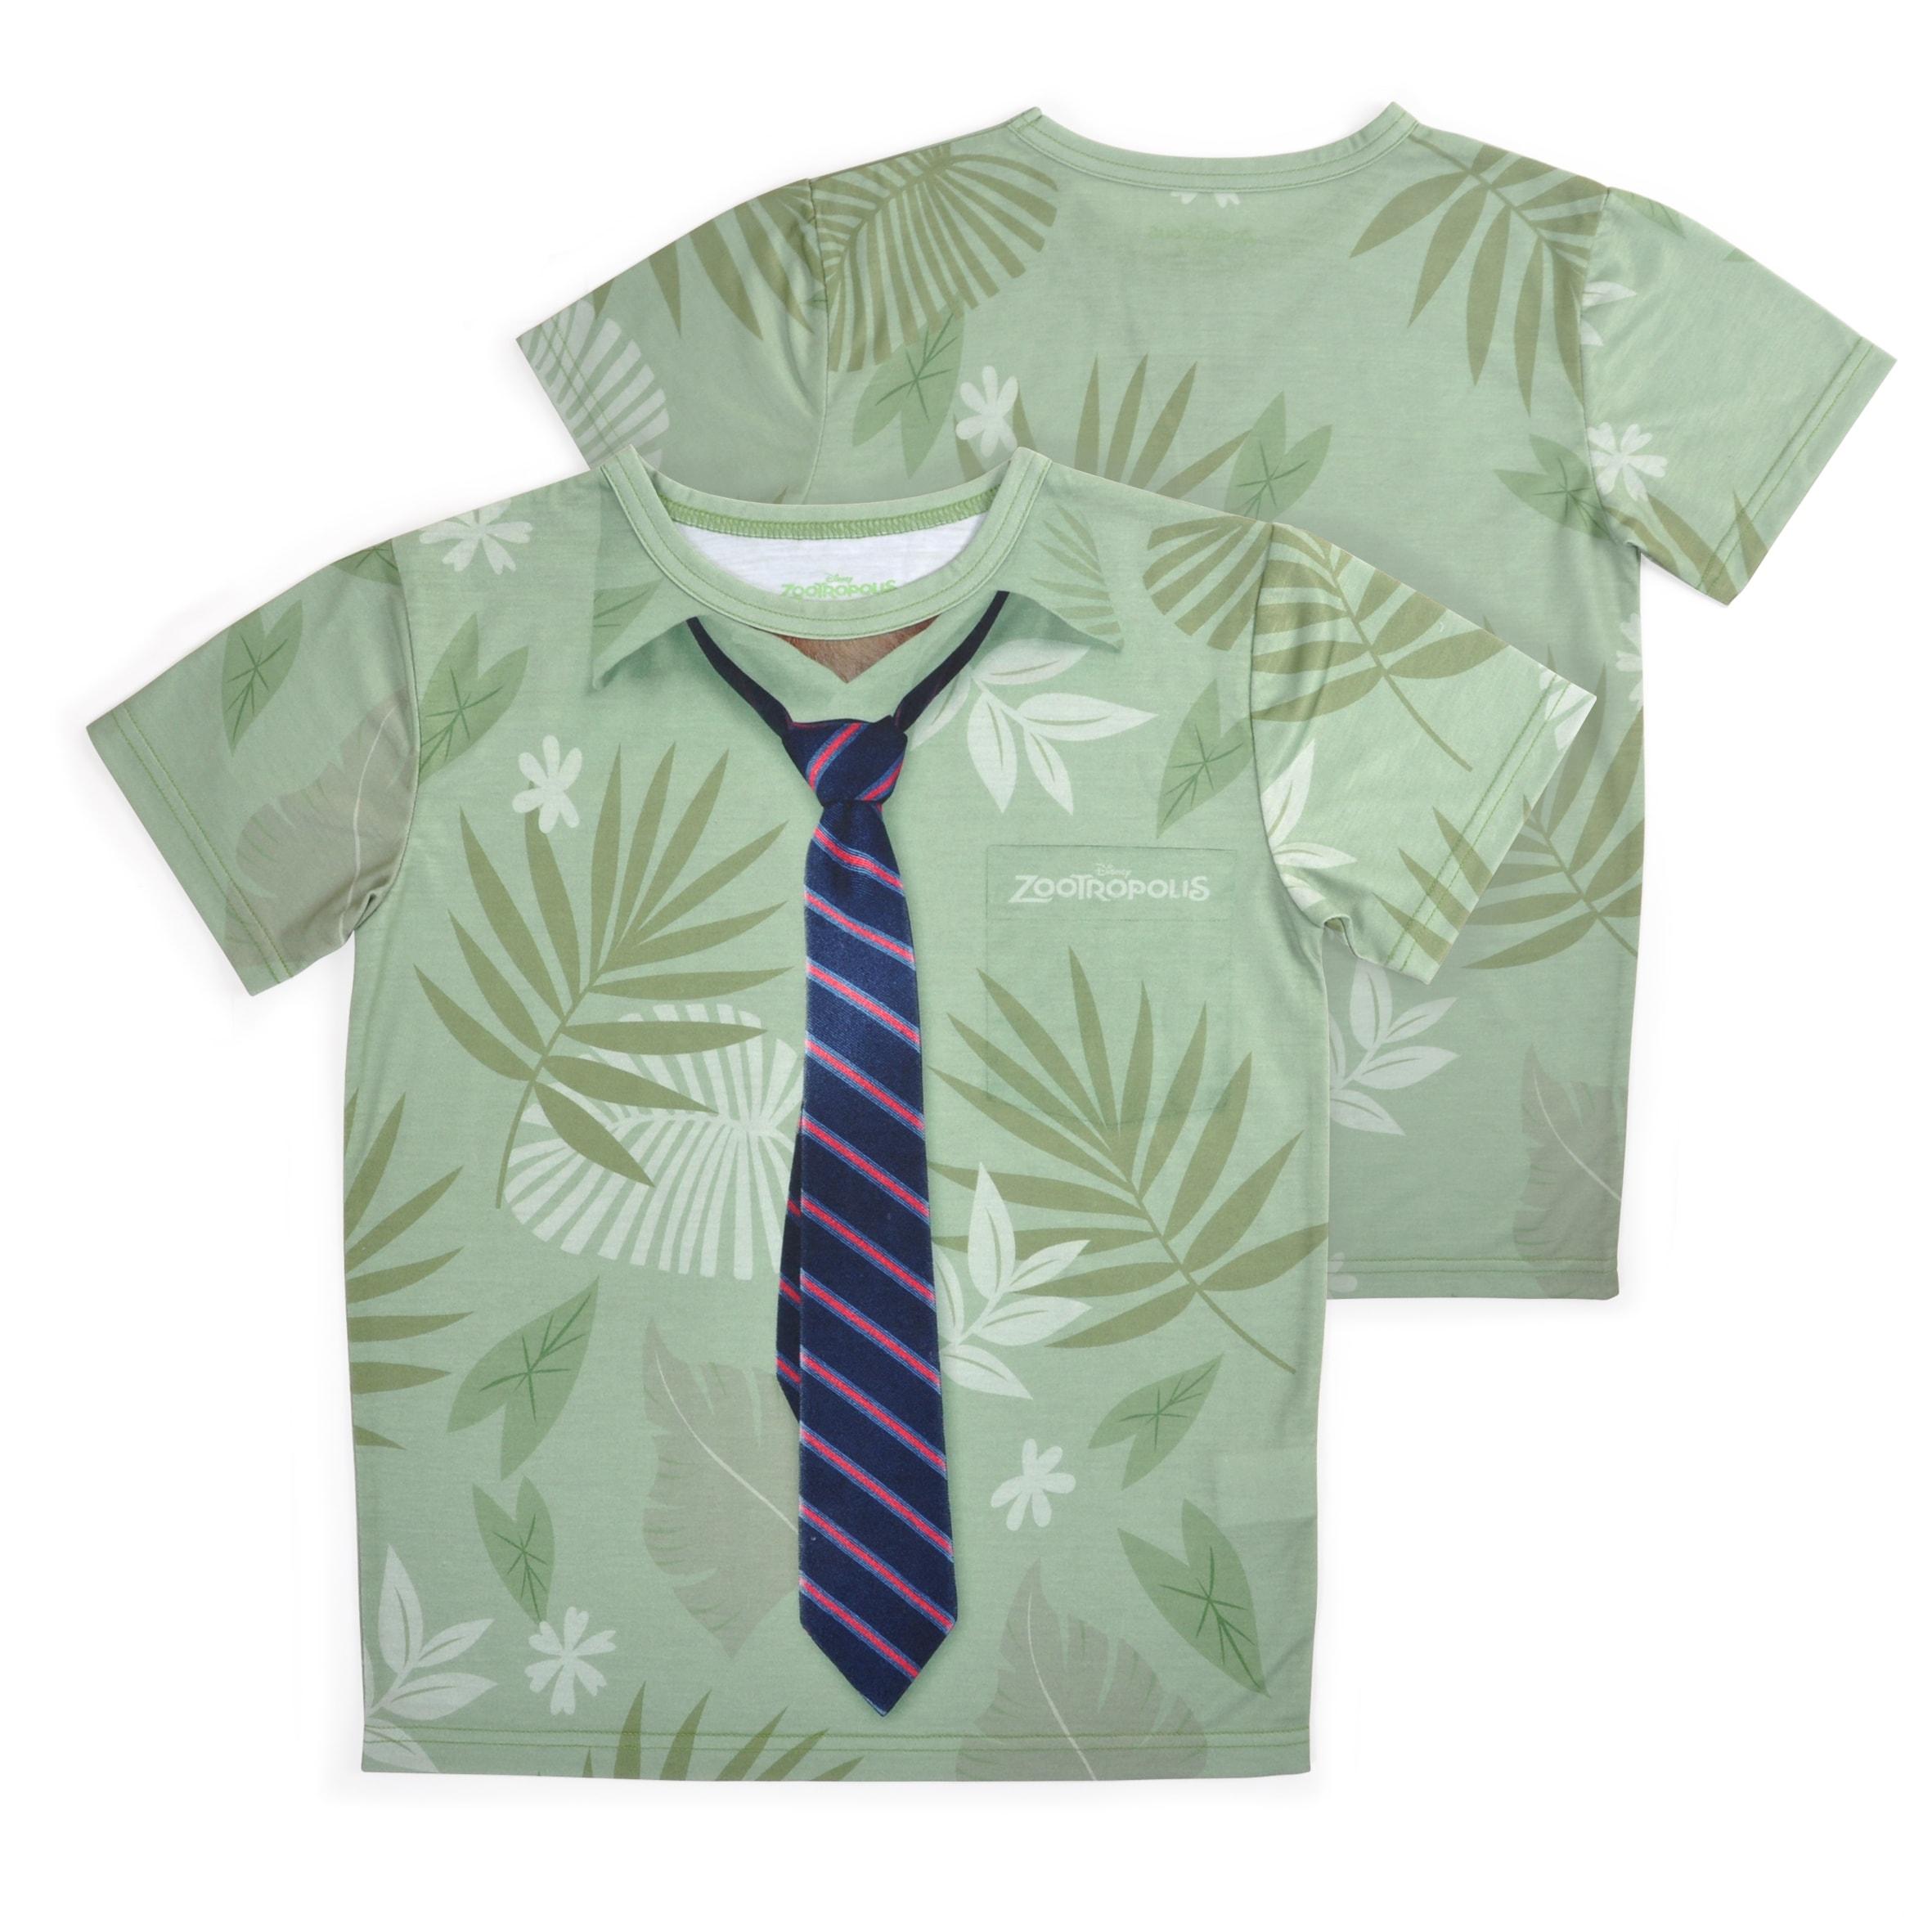 public - Zootropolis Tshirt